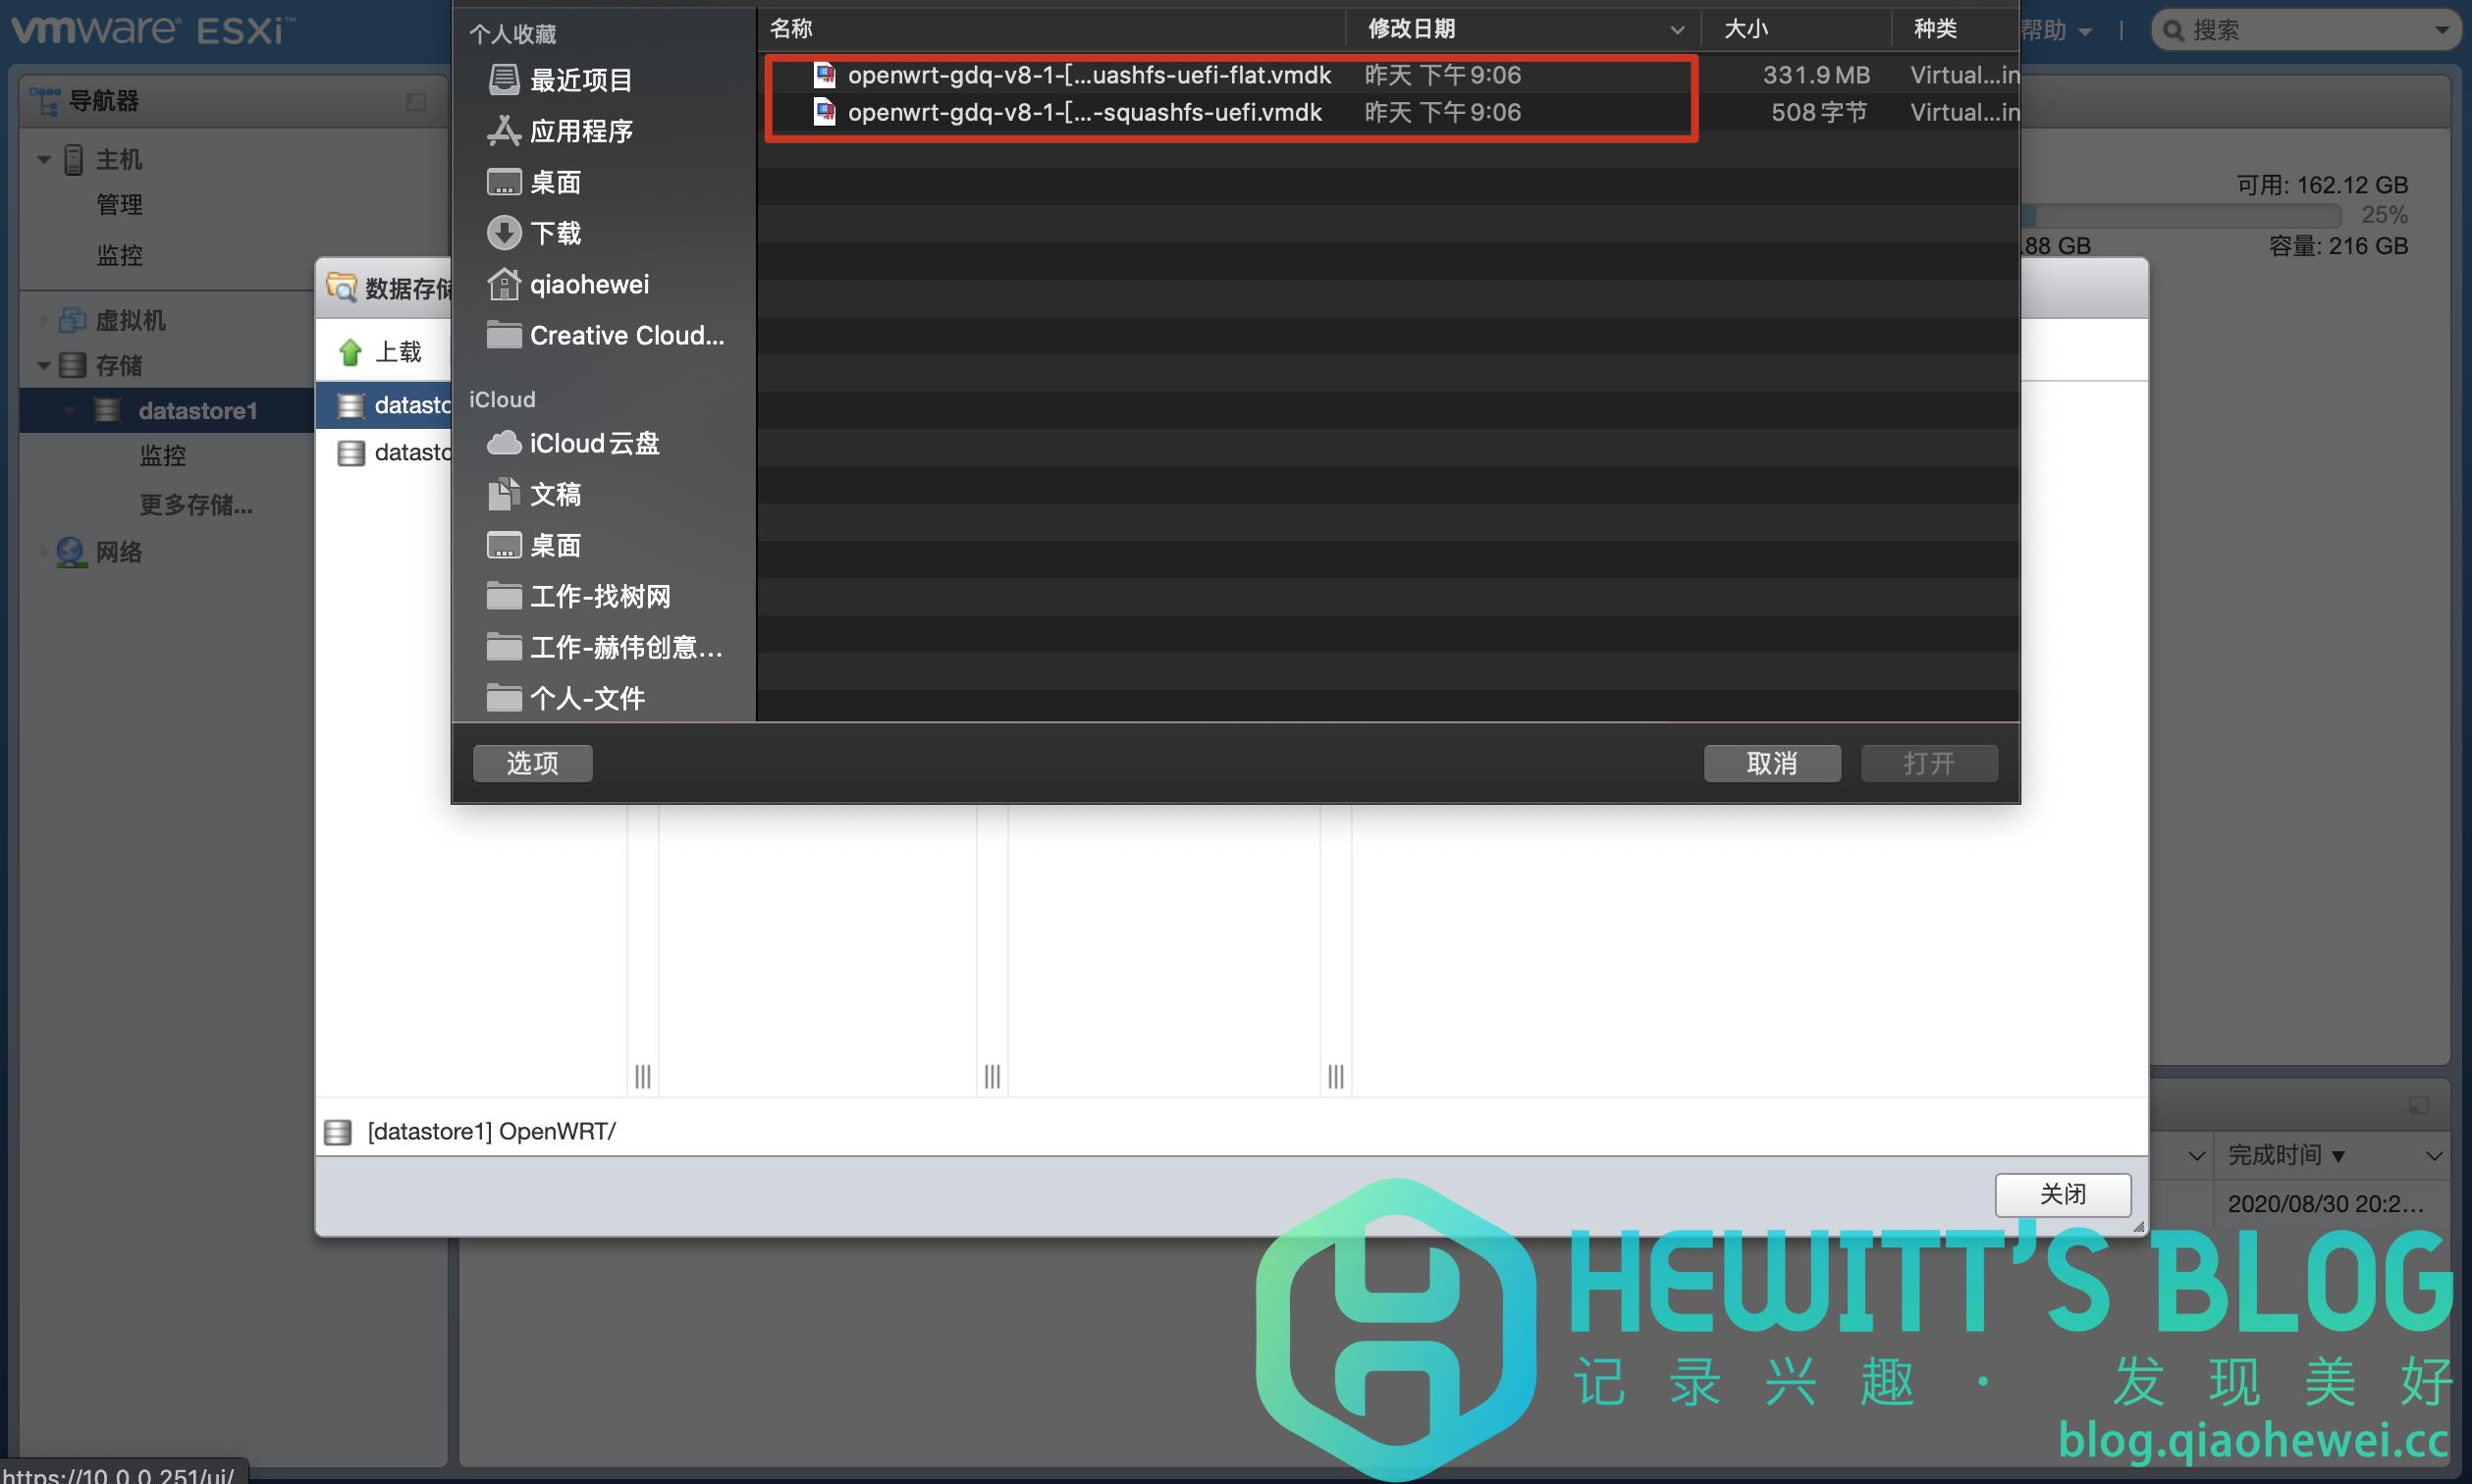 ESXI安装OpenWRT & LEDE软路由部署指南(附镜像下载)插图11